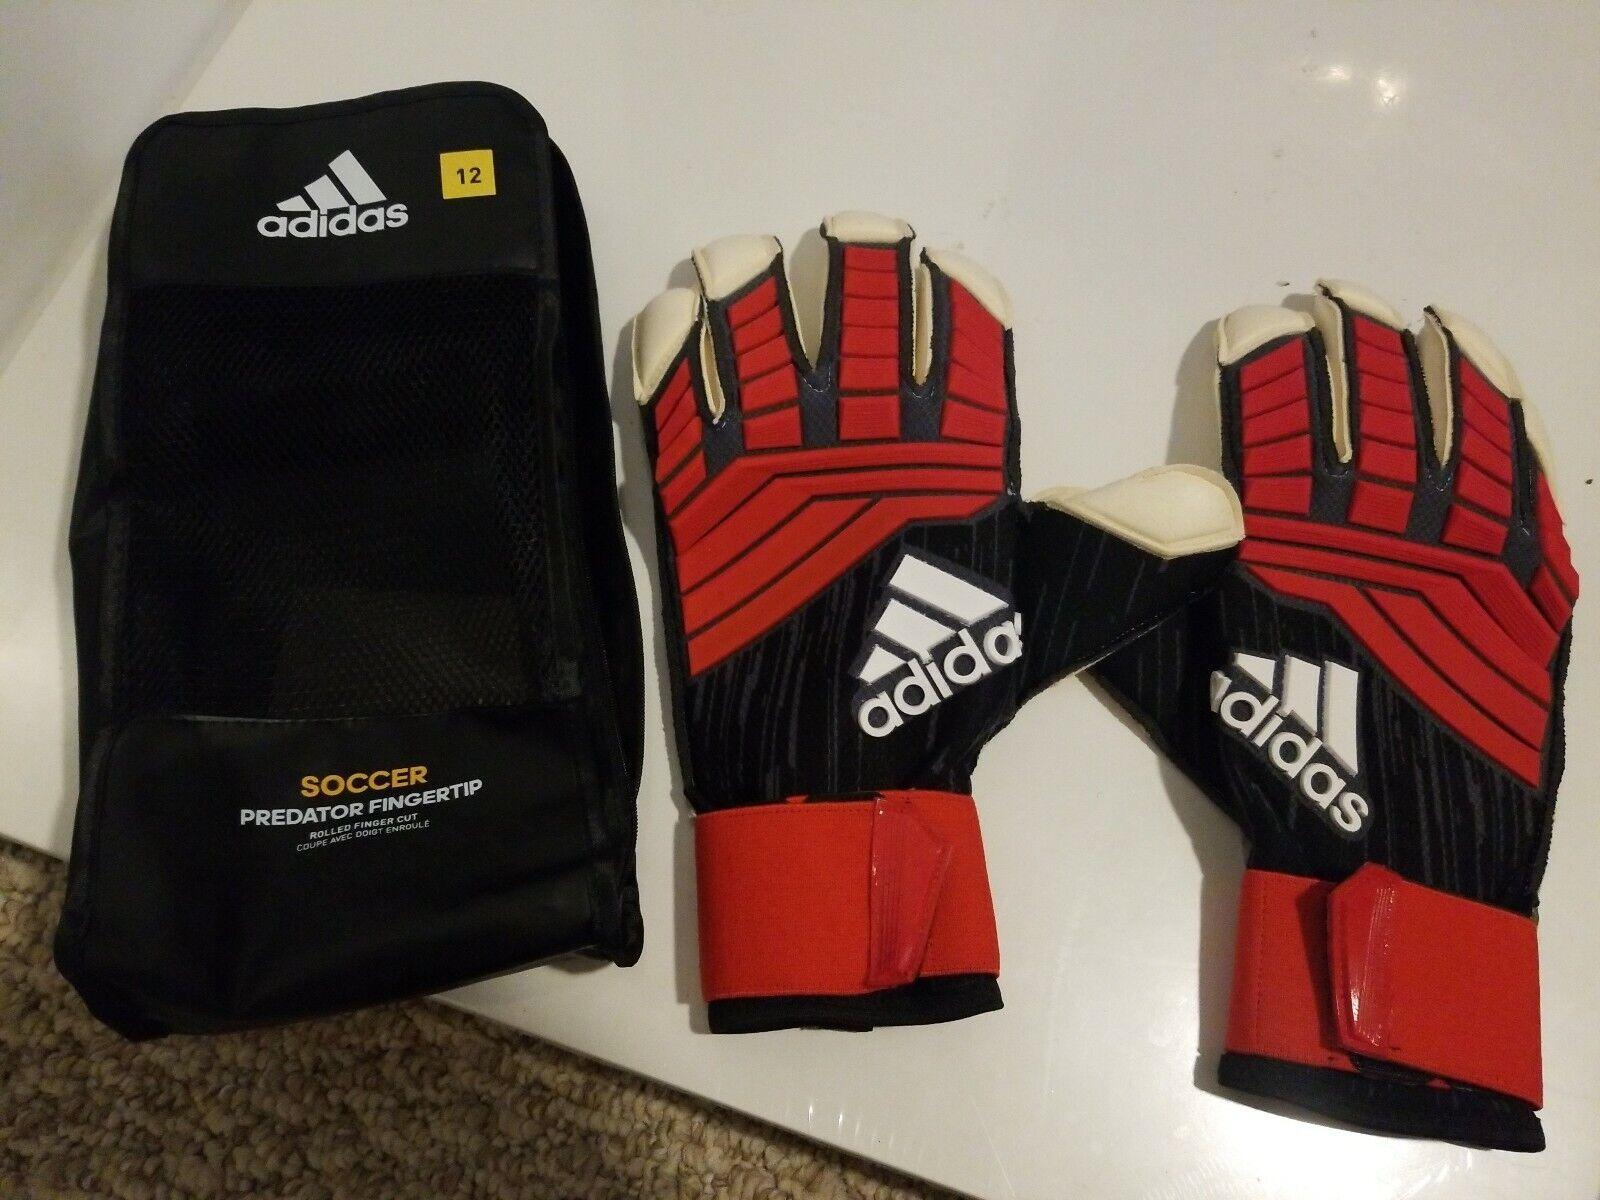 Adidas Fútbol Projoator yema del dedo GK Guantes de portero CW5631 Sz 12 Negro Rojo